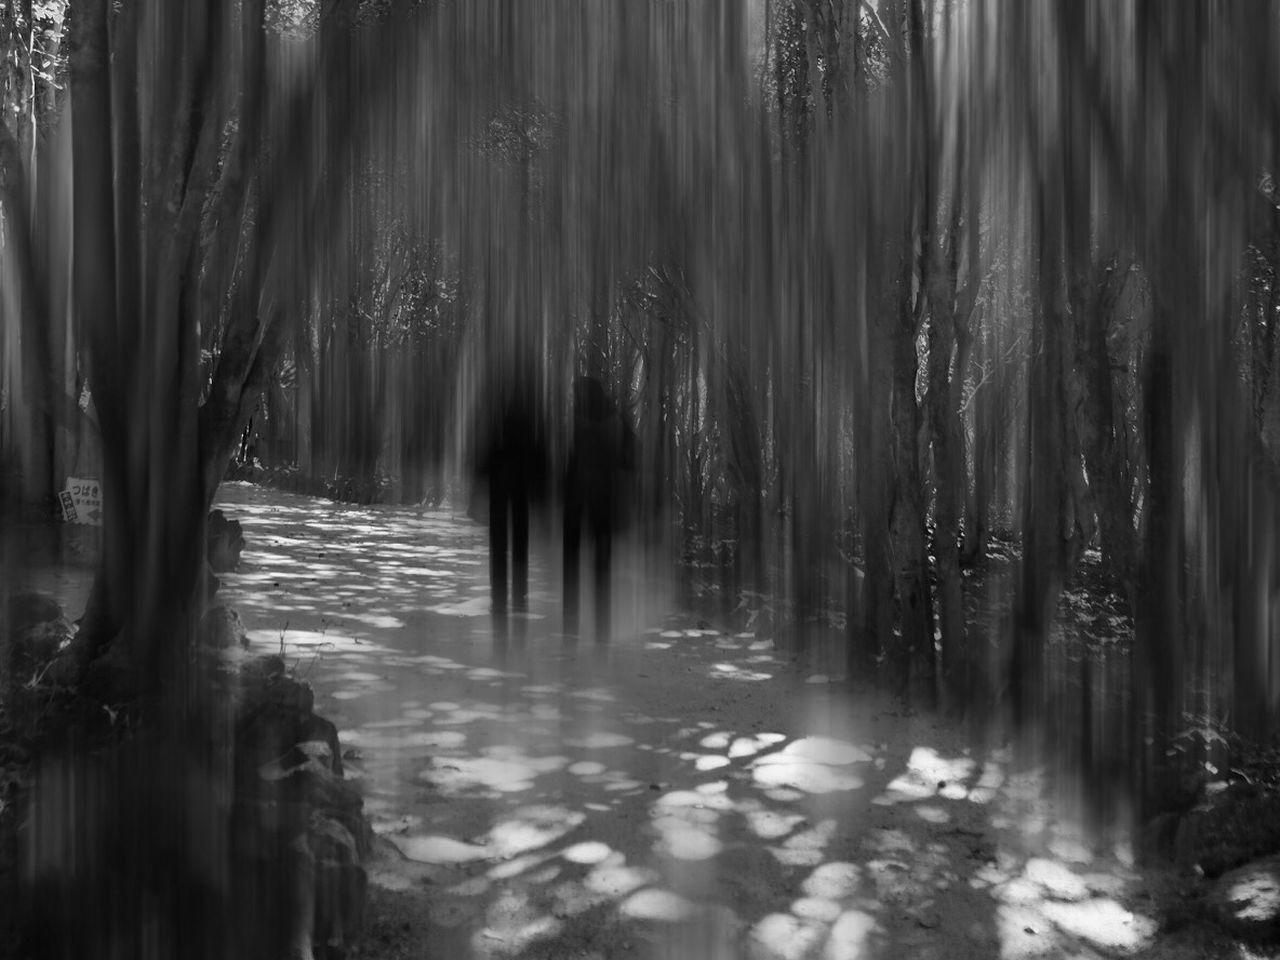 Japan Tree Fujifilm FUJIFILM X-T1 Japan Photography Light And Shadow Blurred Motion